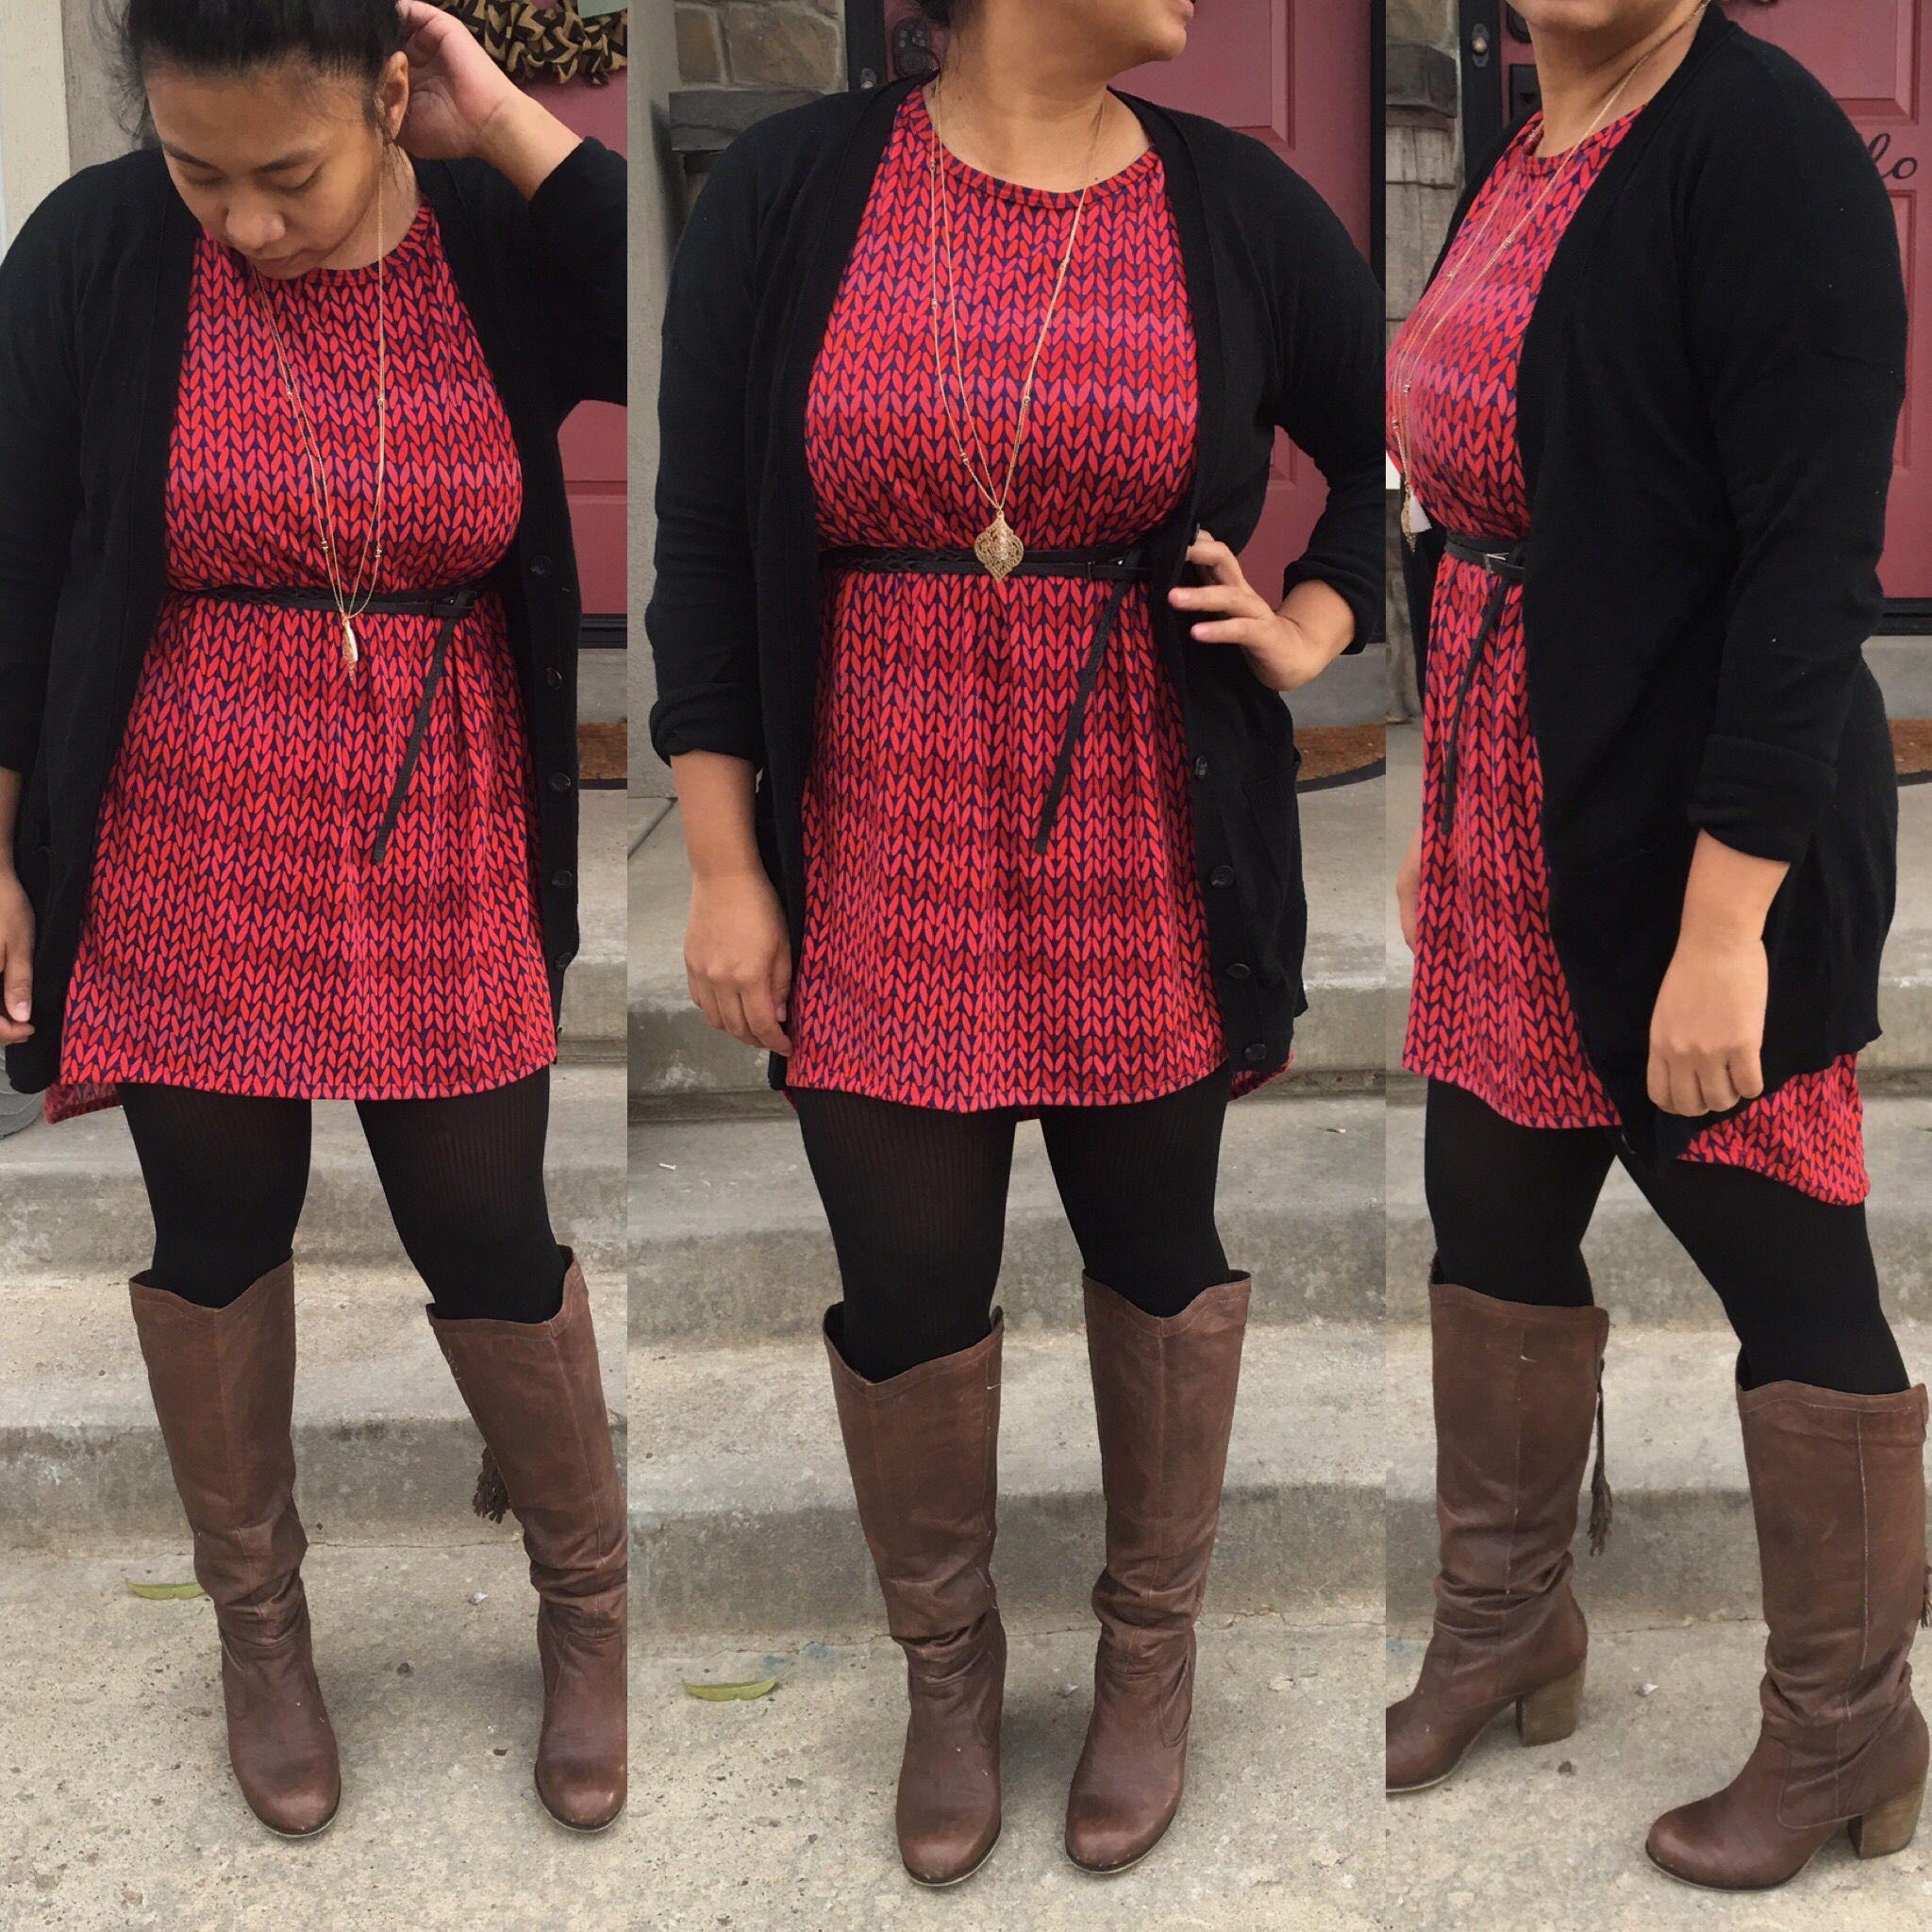 4089c959a56b93 XL LuLaroe Irma as a dress, LuLaroe irma, how to wear an Irma as a dress,  LuLaroe outfits, fall LuLaroe, fall outfits, fall style Cardigan: Mossimo  Dress: ...